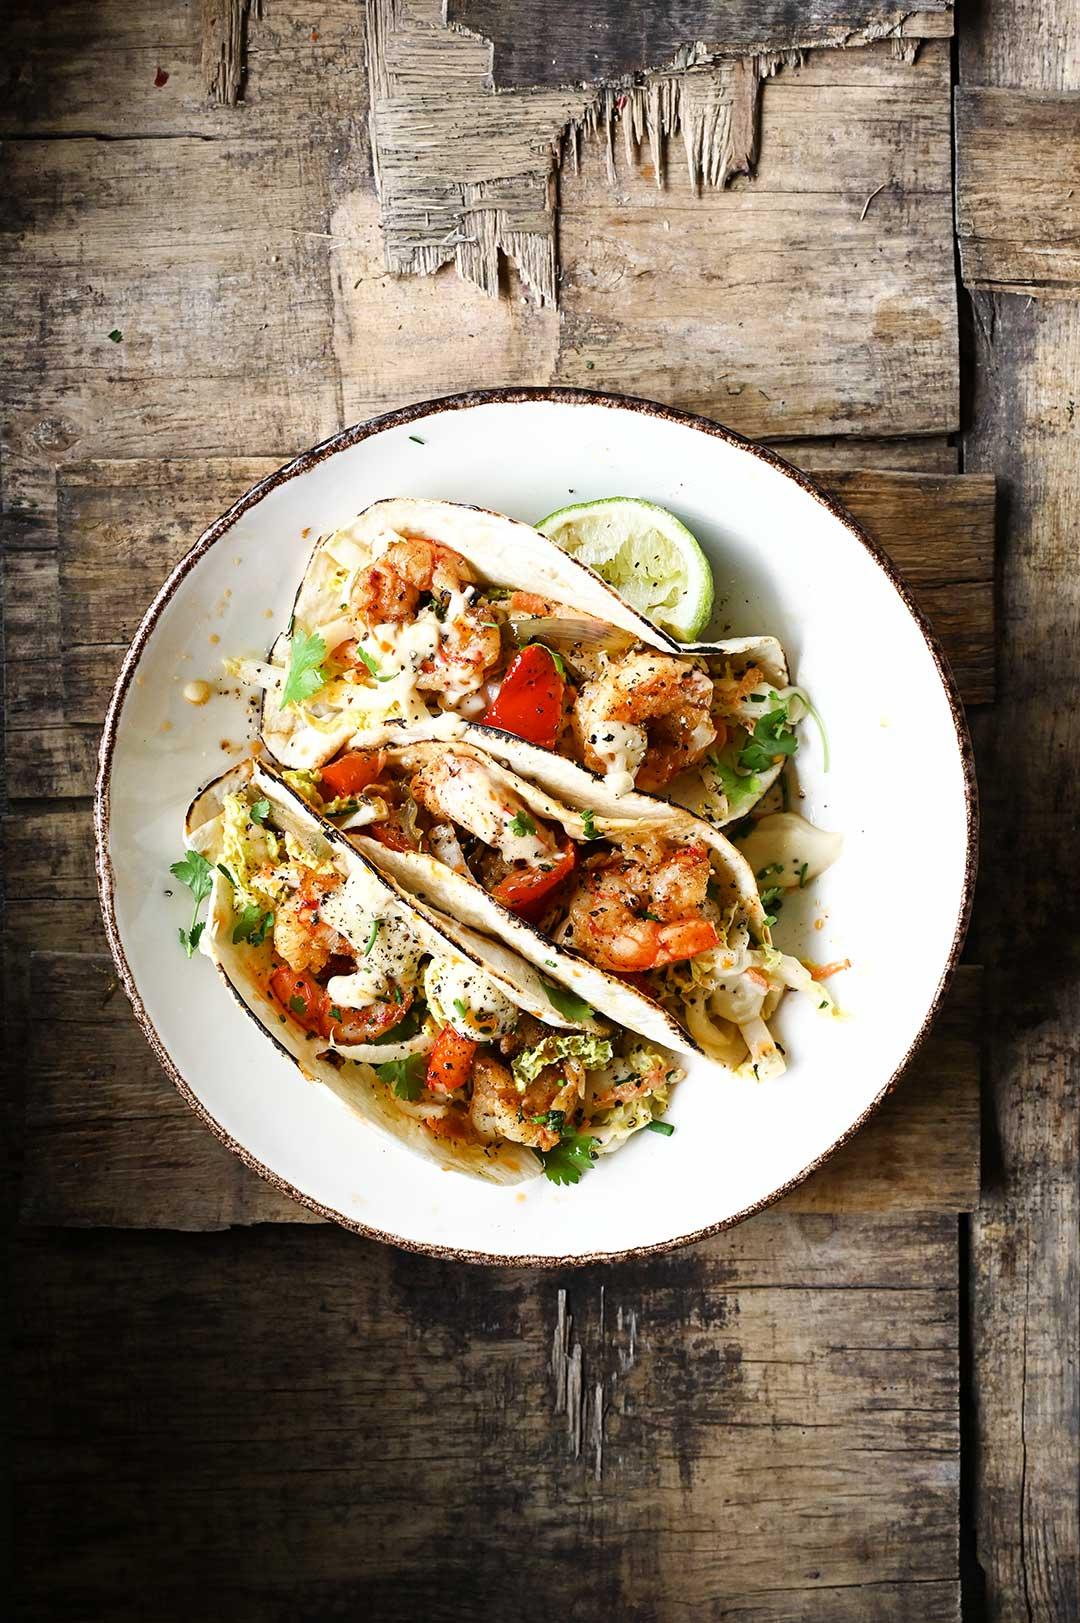 serving dumplings | Tacos z krewetkami i surówką z miso aioli